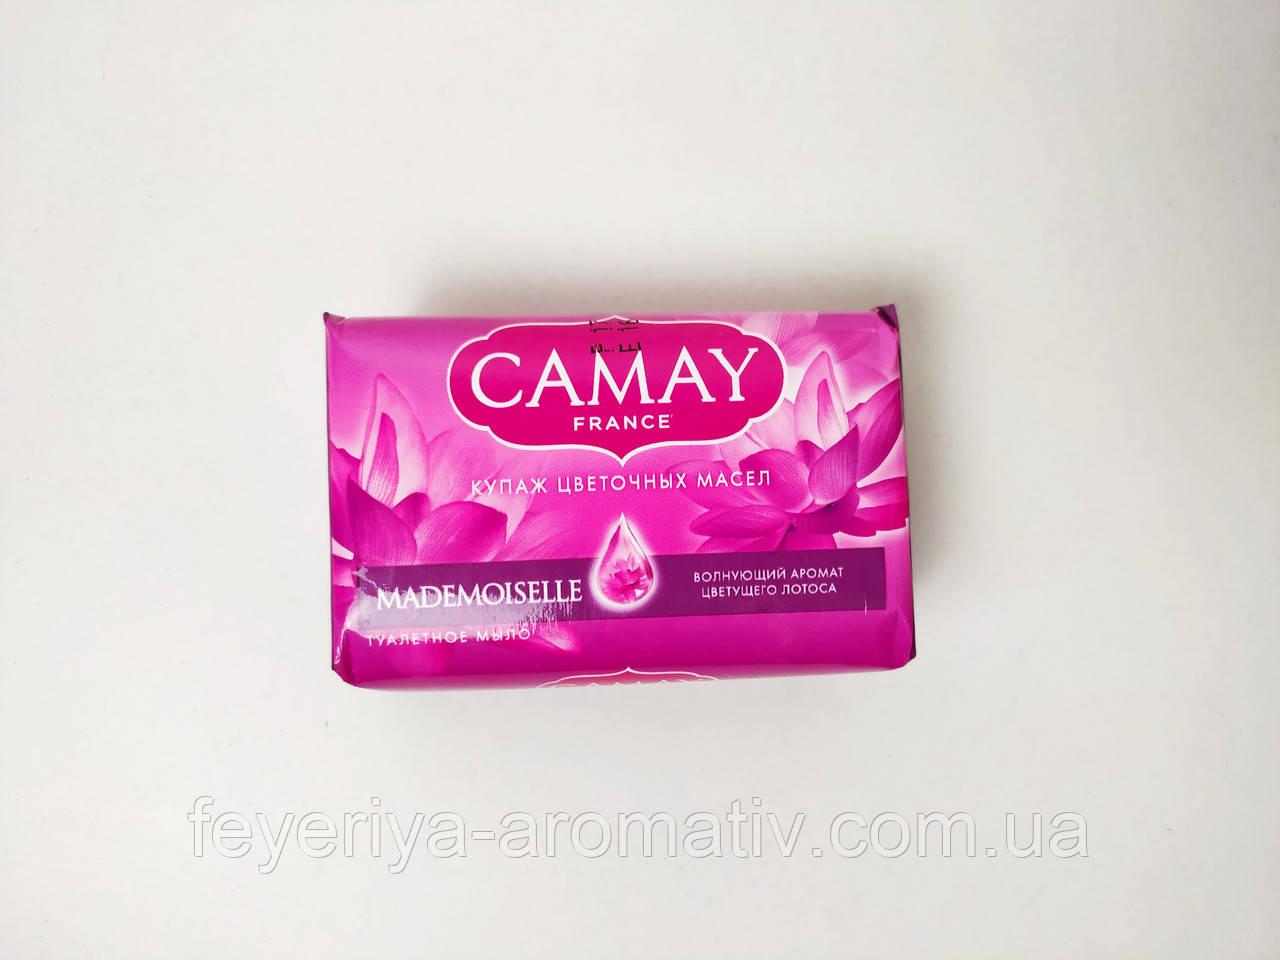 Туалетное мыло Camay Mademoiselle с ароматом лотоса 85г. (Египет)